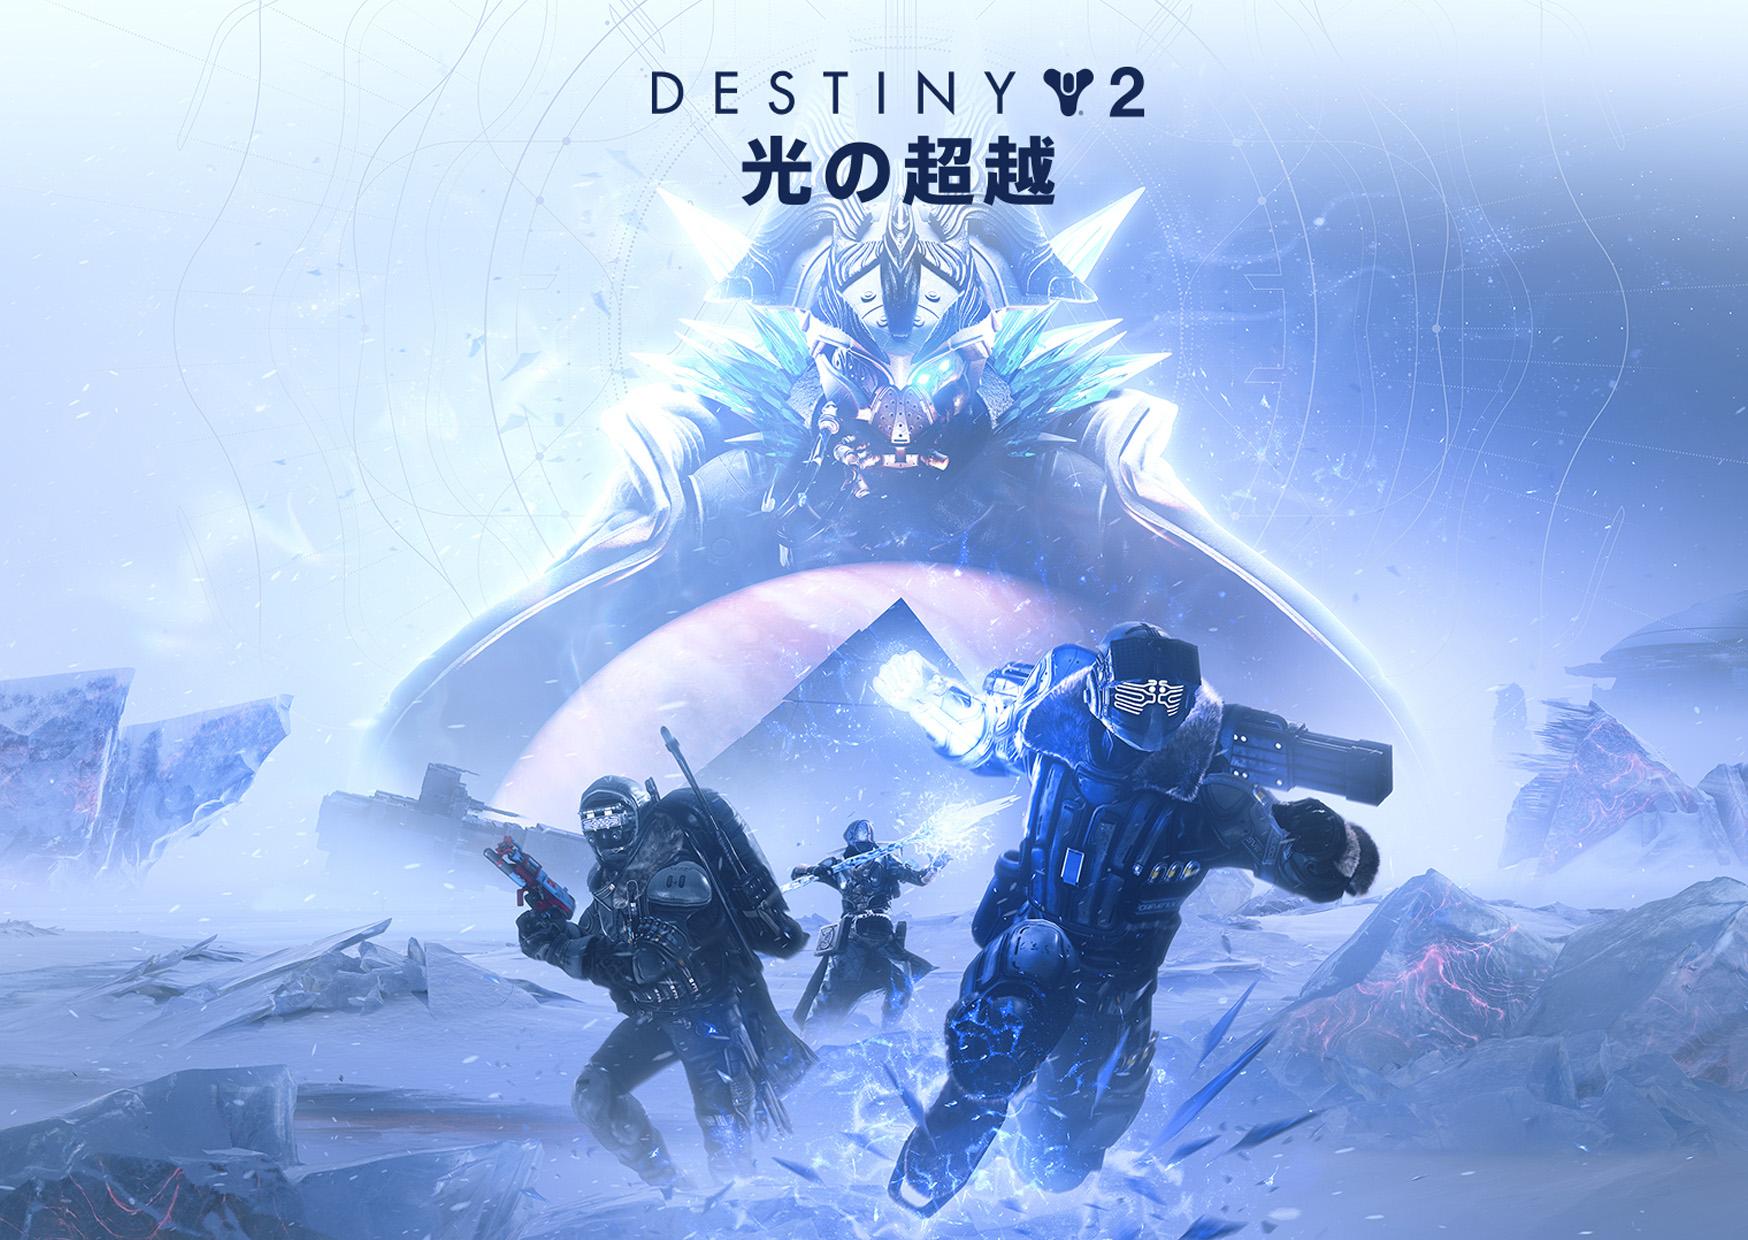 【Destiny 2】最新拡張コンテンツ「光の超越」が11月11日全世界同時発売!